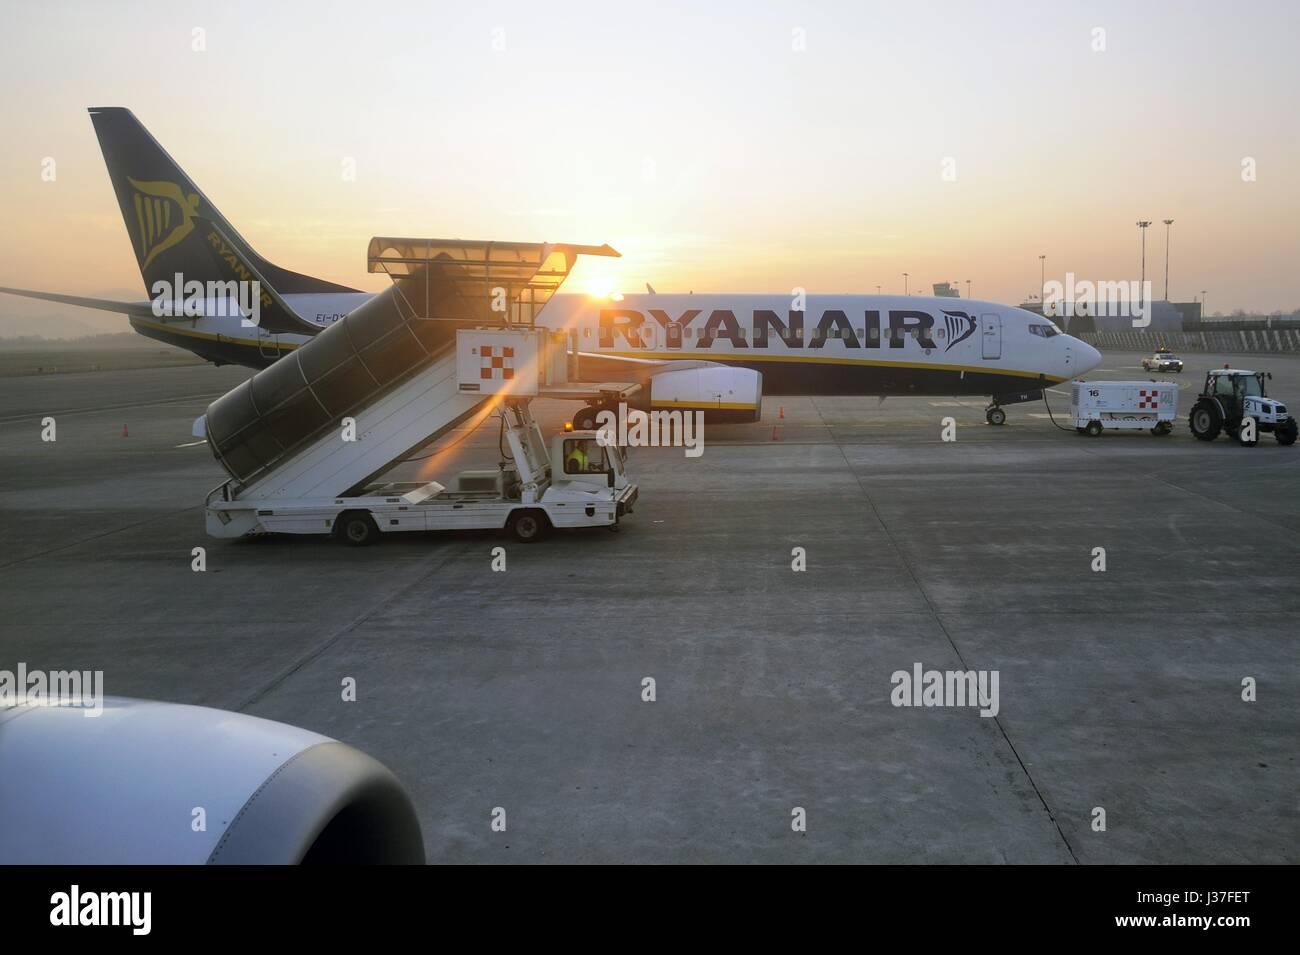 Aeroporto Orio : Orio al serio stock photos orio al serio stock images alamy